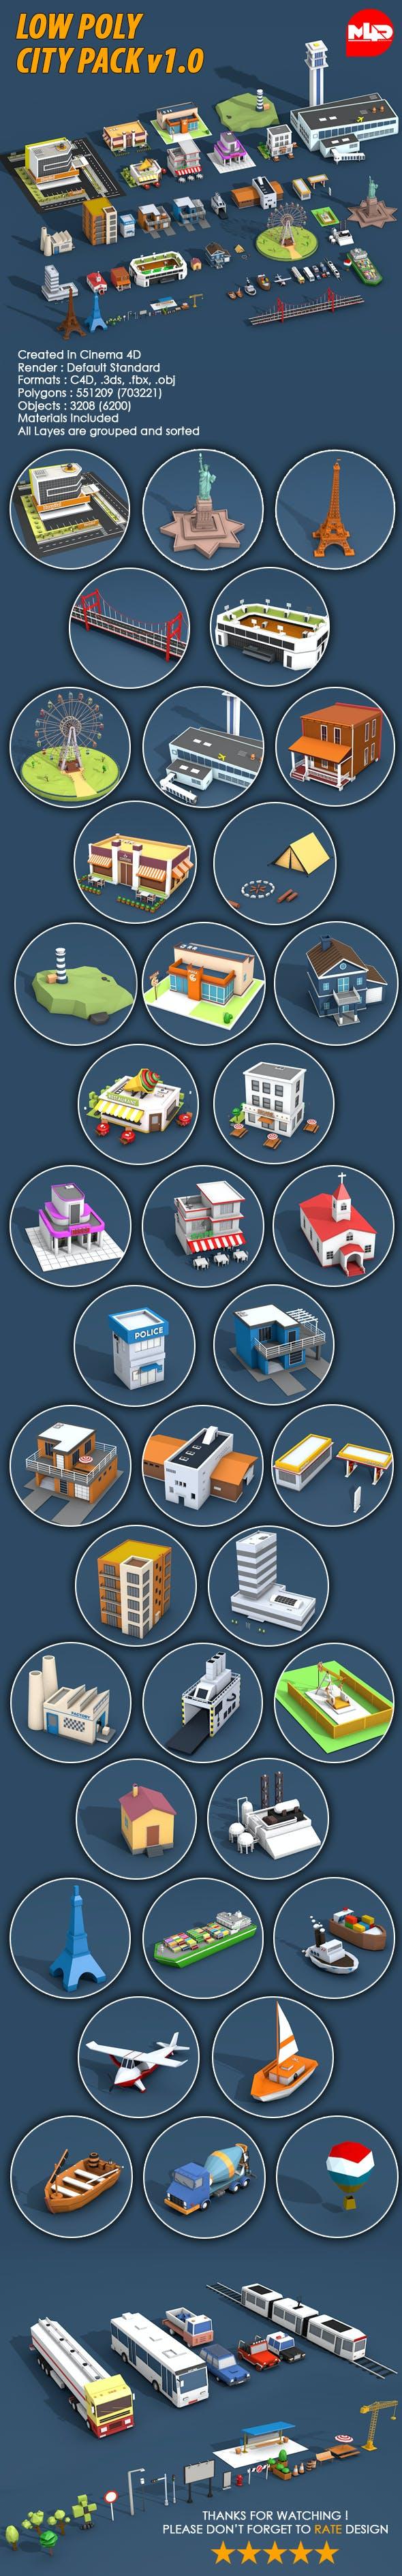 Low Poly City Pack v1.0 - 3DOcean Item for Sale